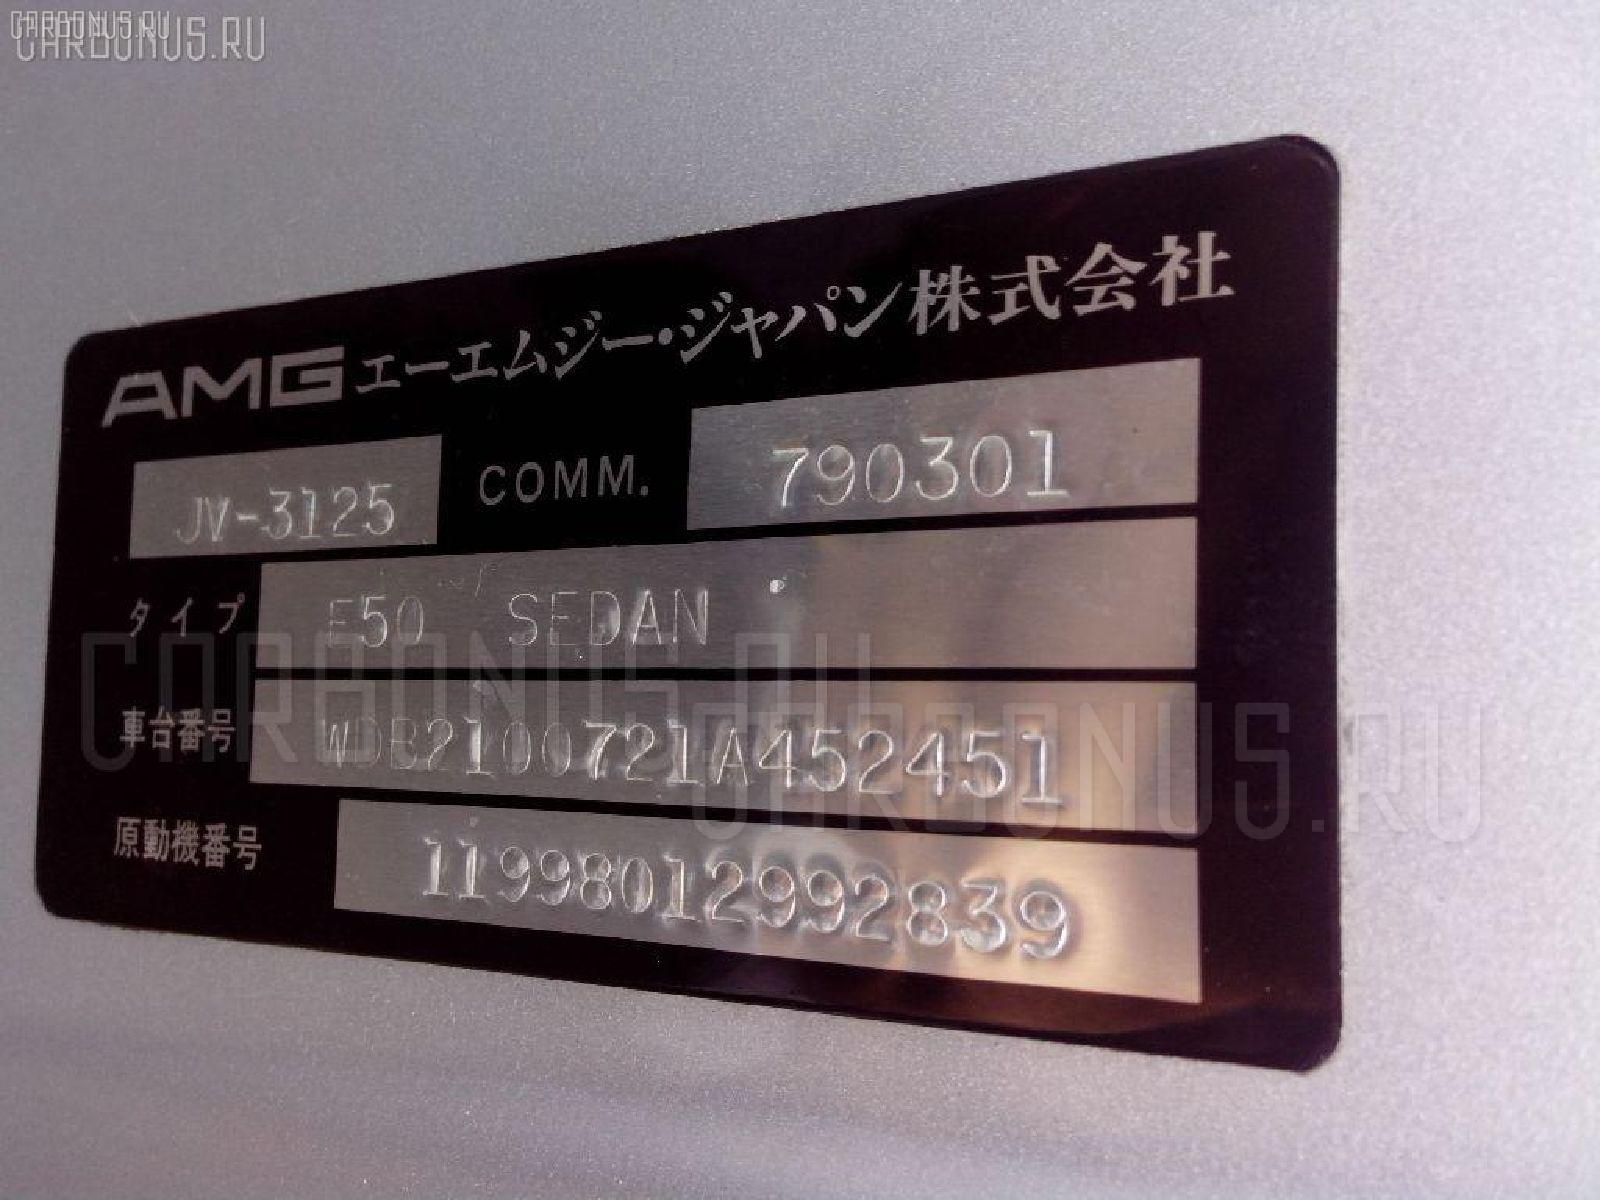 Клемма F MERCEDES-BENZ E-CLASS W210.072 1997.06 A2105460241 2WD 4D Фото 5